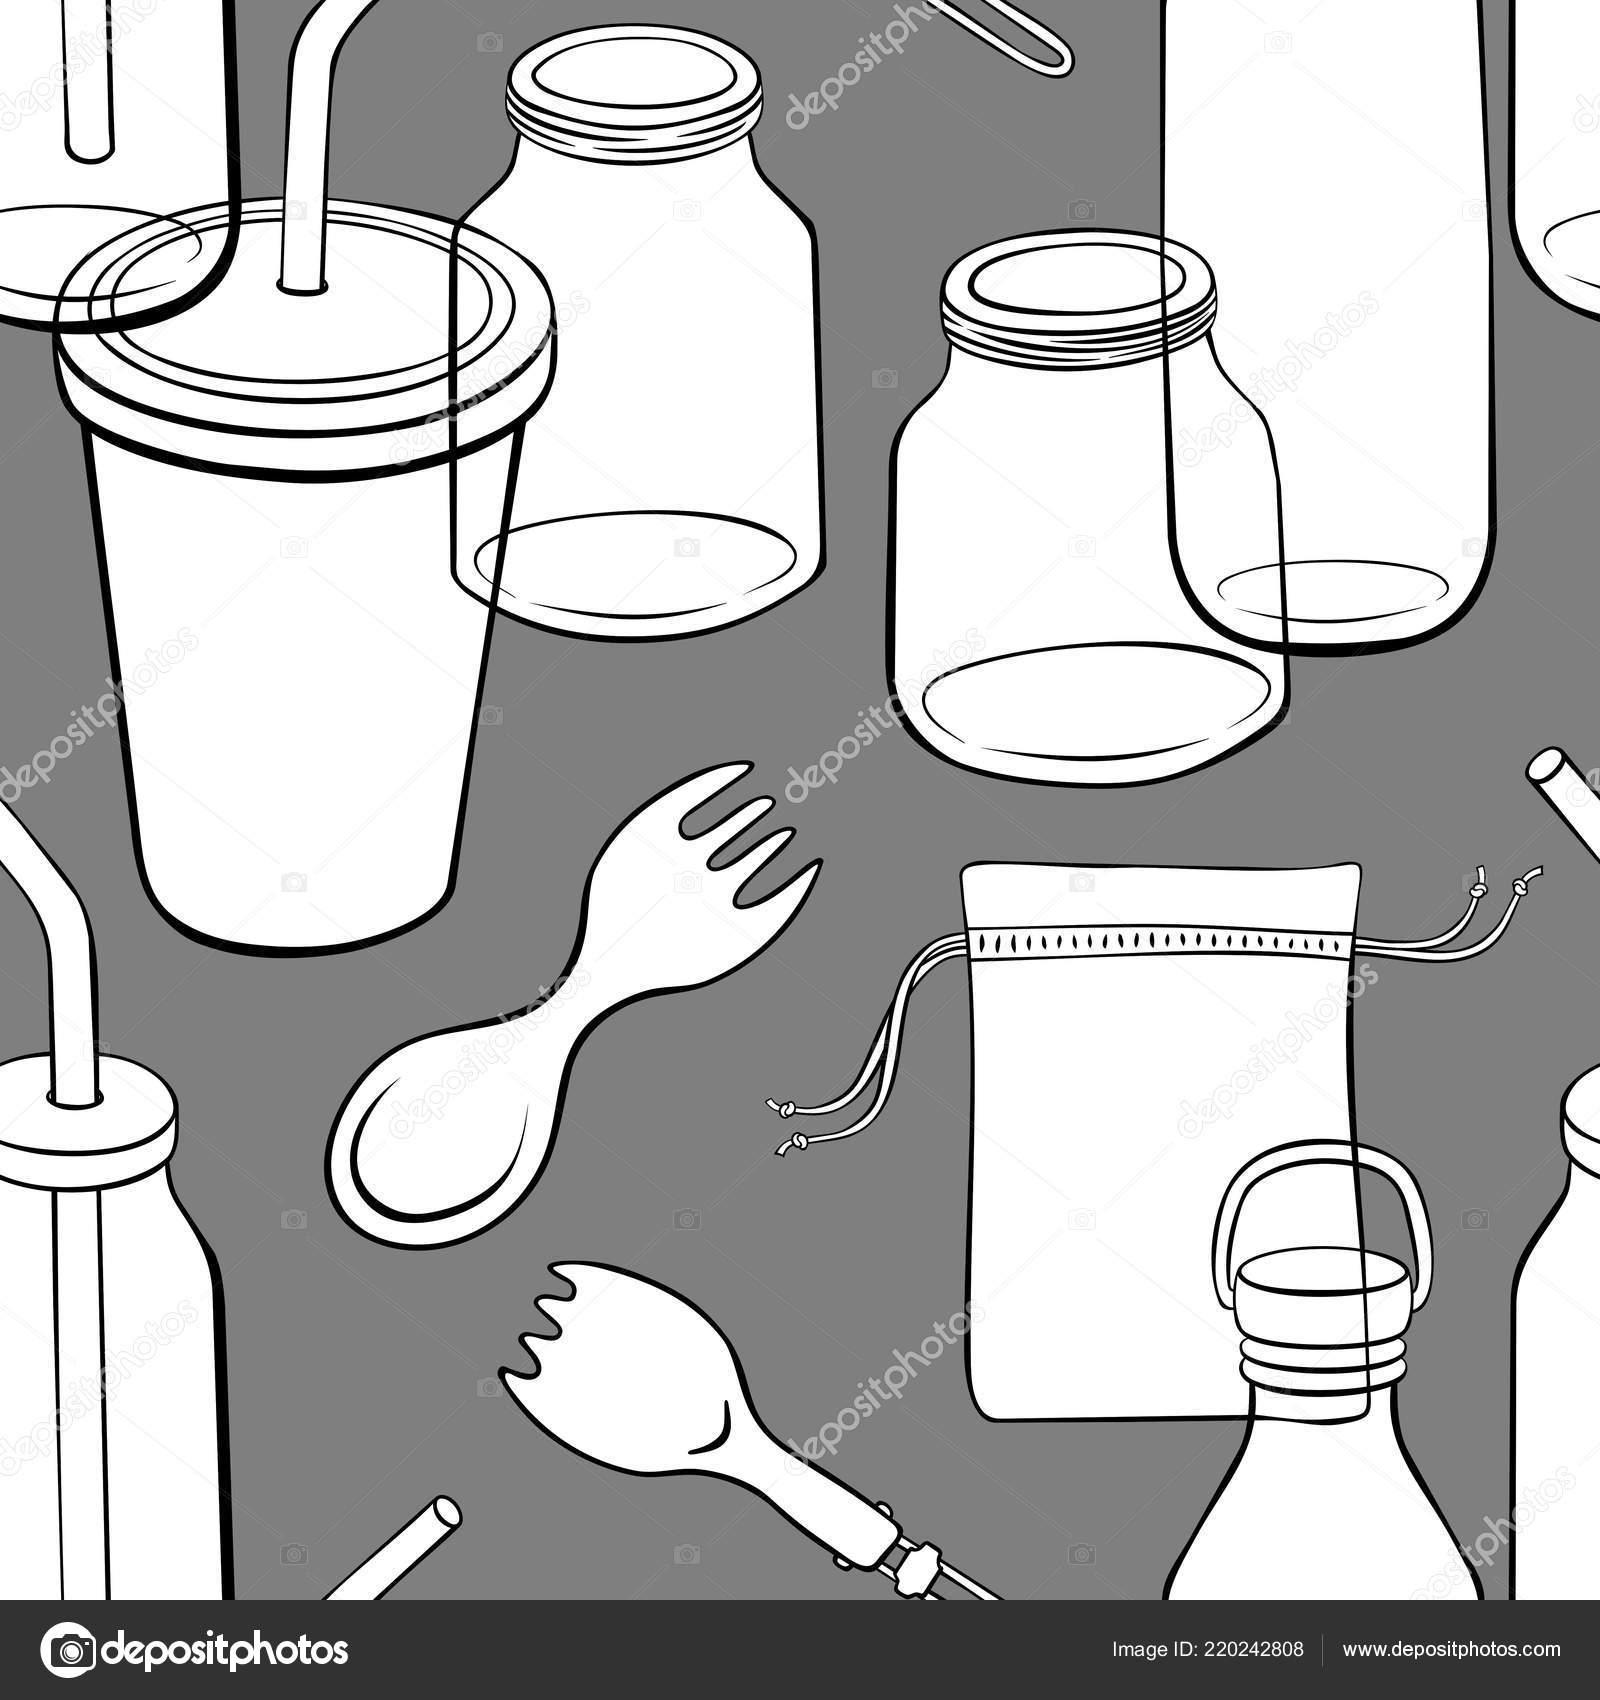 black kitchen appliances cabinet doors with glass 零废弃物厨房用具无缝的模式与手绘黑色和白色元素在黑暗的背景 图库矢量 零废弃物厨房用具无缝的模式与手绘黑色和白色元素在